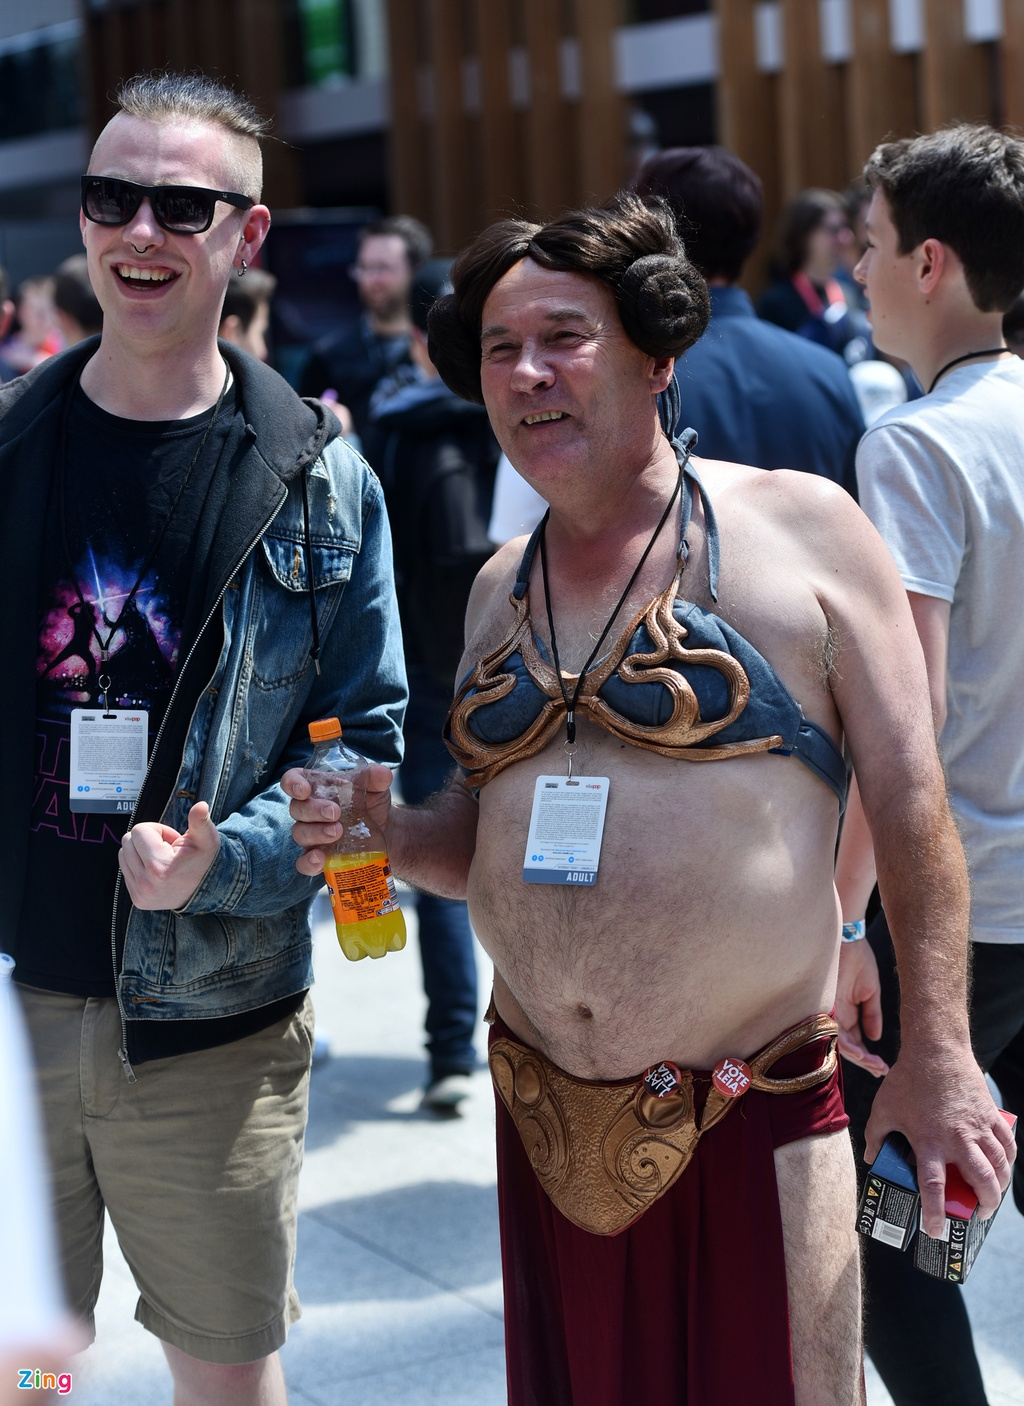 Van hoa cosplay cua nguoi phuong Tay qua 'Star Wars' hinh anh 2